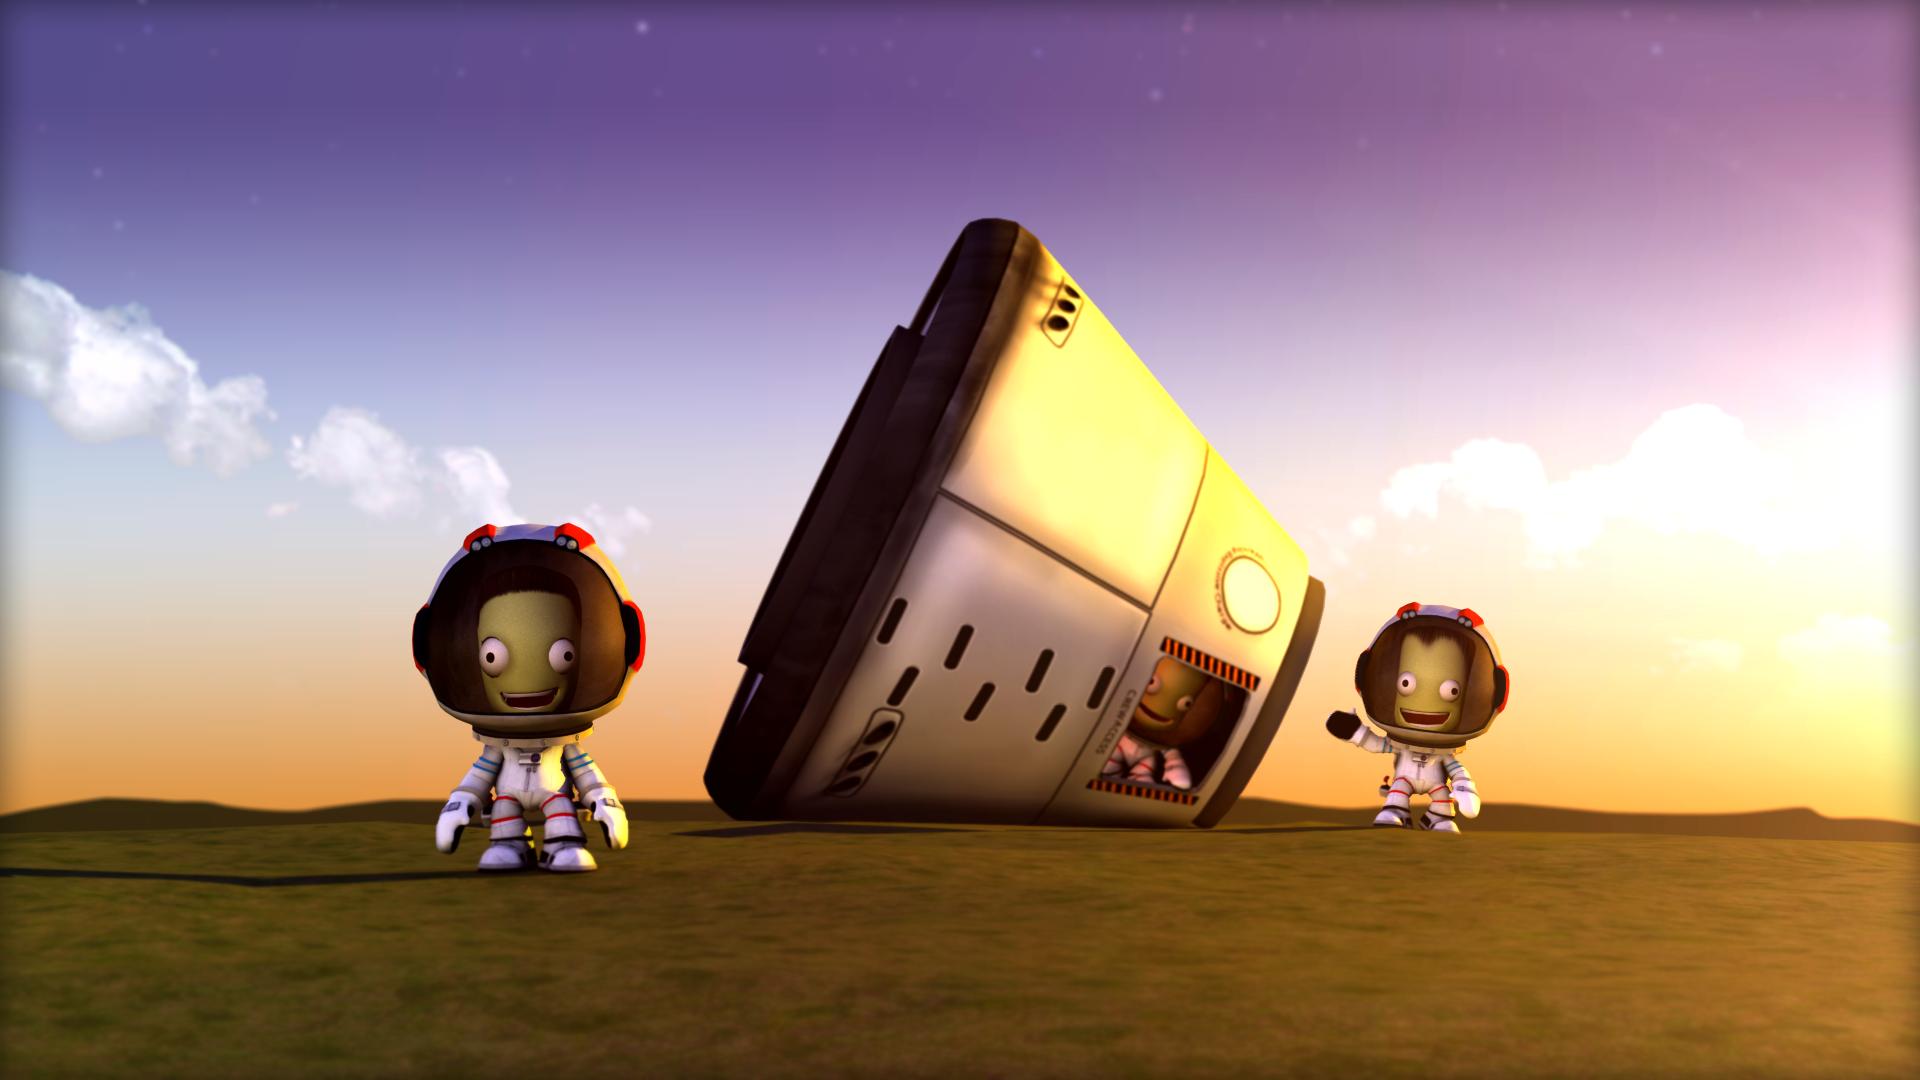 kerbal space program xbox one - HD1920×1080